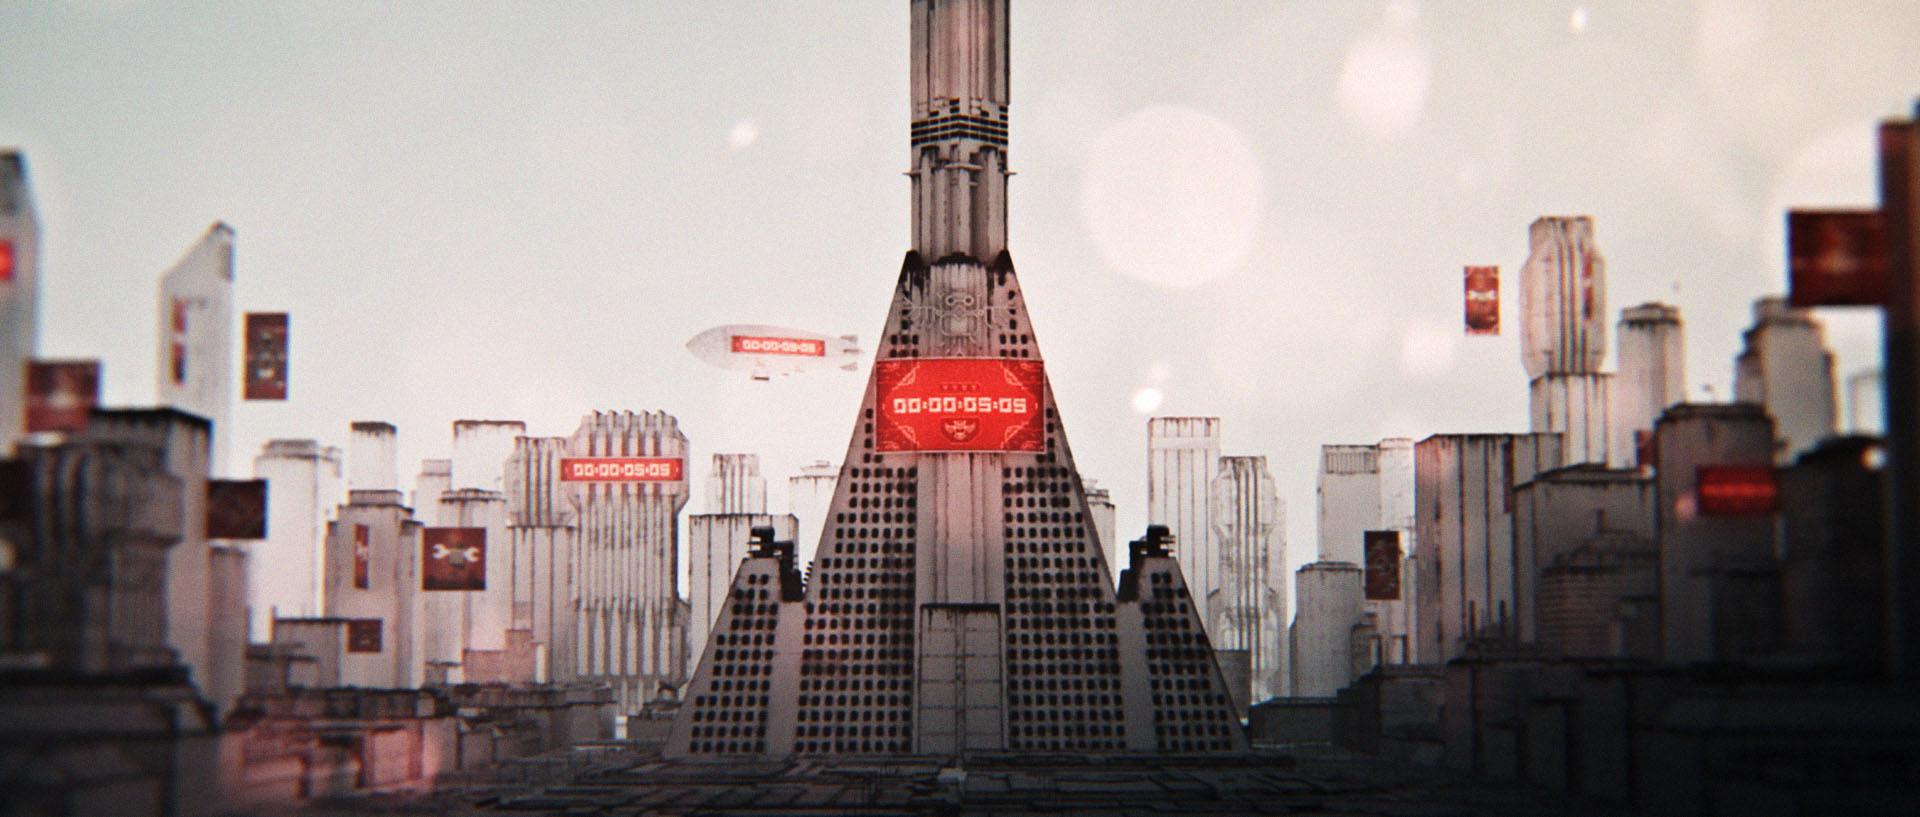 Sci-Fi-London_0007_08.jpg